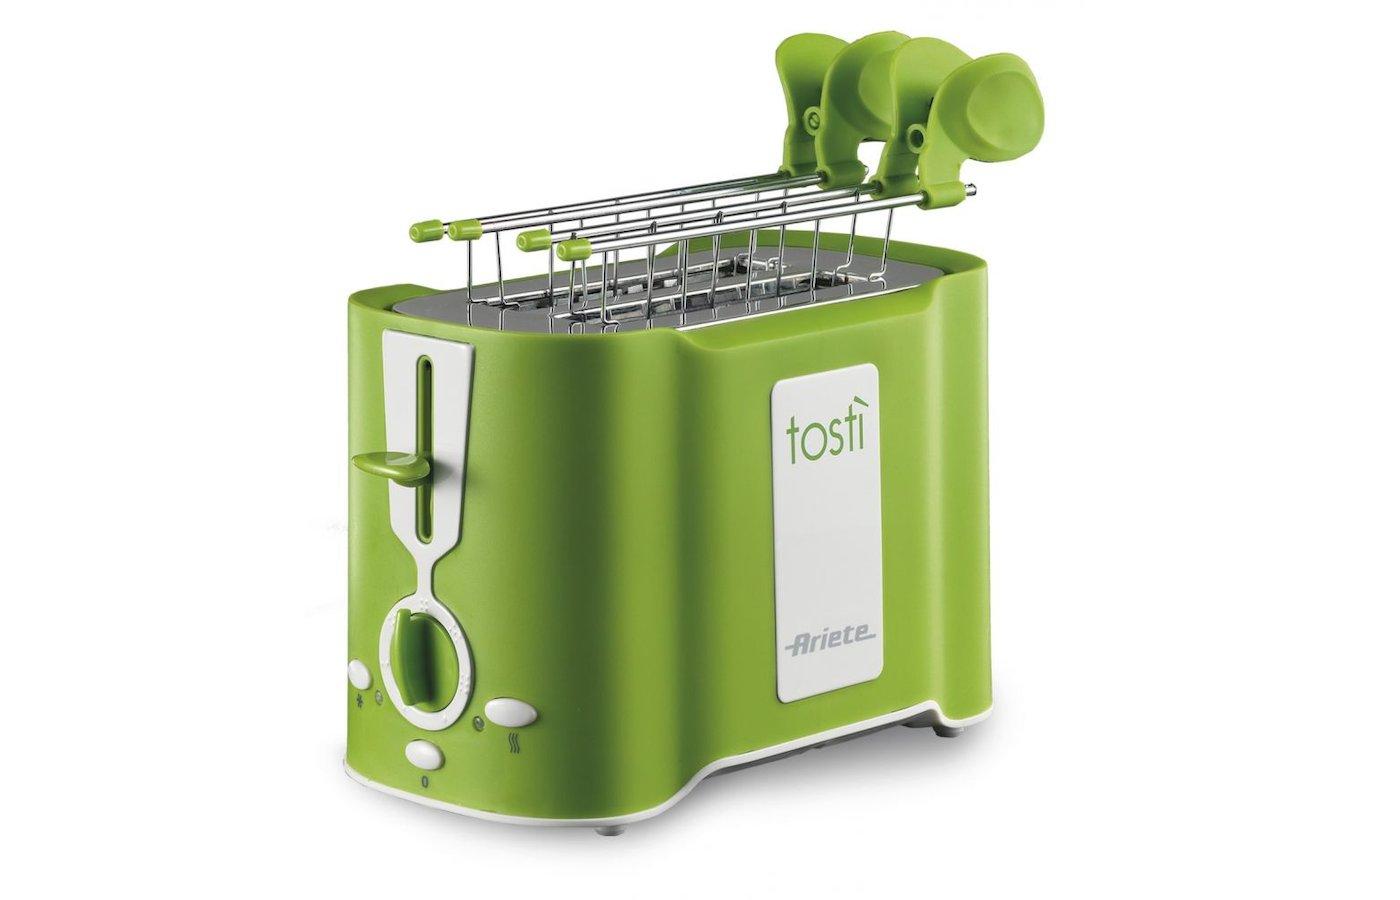 Тостер ARIETE 124/12 Toasty